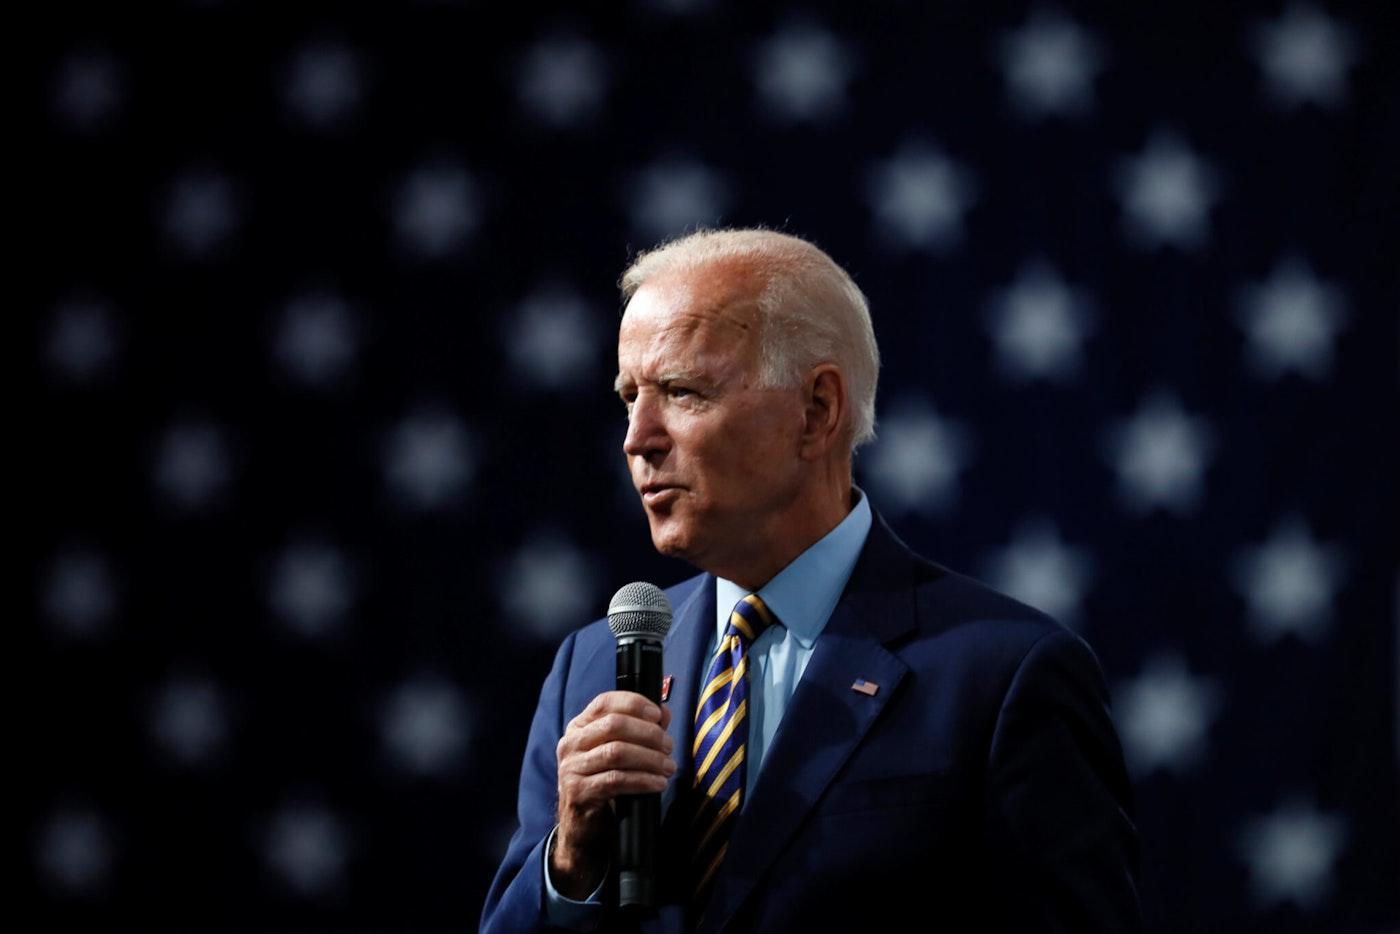 Democratic presidential candidate former Vice President Joe Biden speaks at the Presidential Gun Sense Forum, Saturday, Aug. 10, 2019, in Des Moines, Iowa. (AP Photo/Charlie Neibergall)